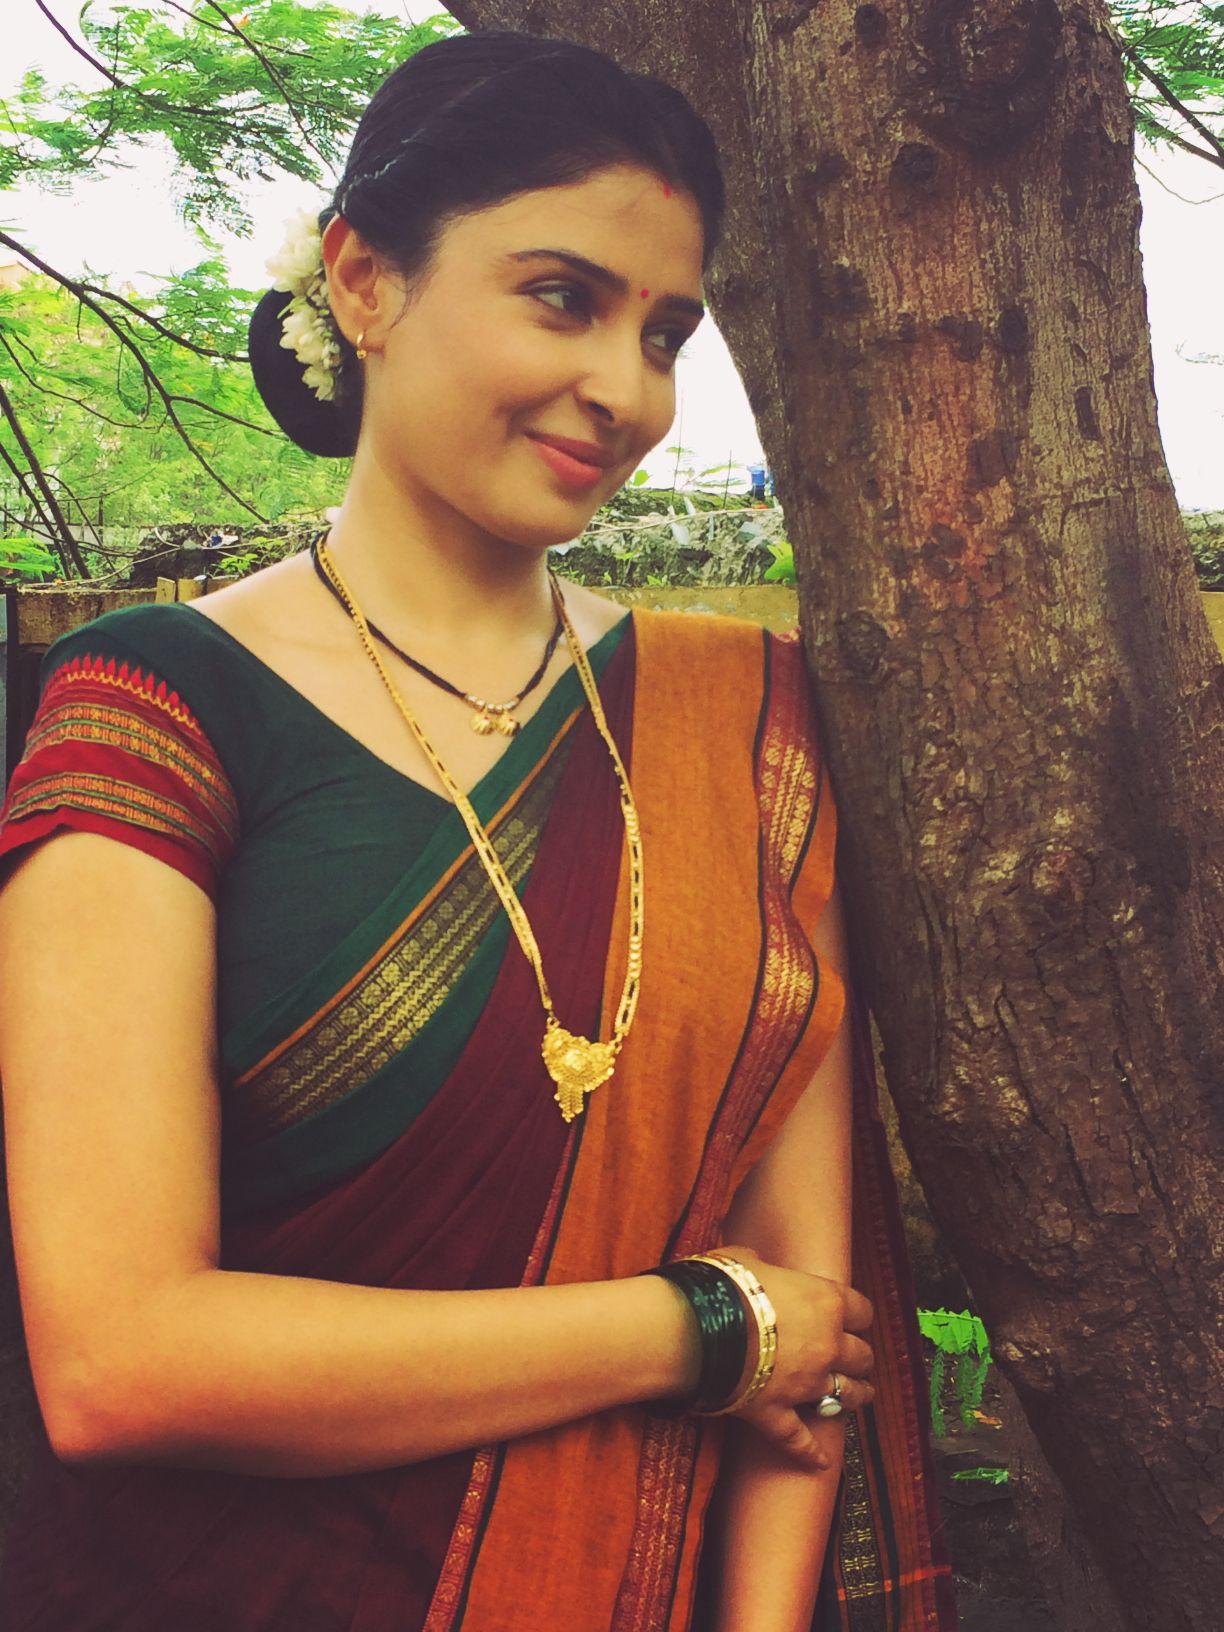 Pin by Shweta Munshi on Shweta Munshi in 2019 | Cute woman